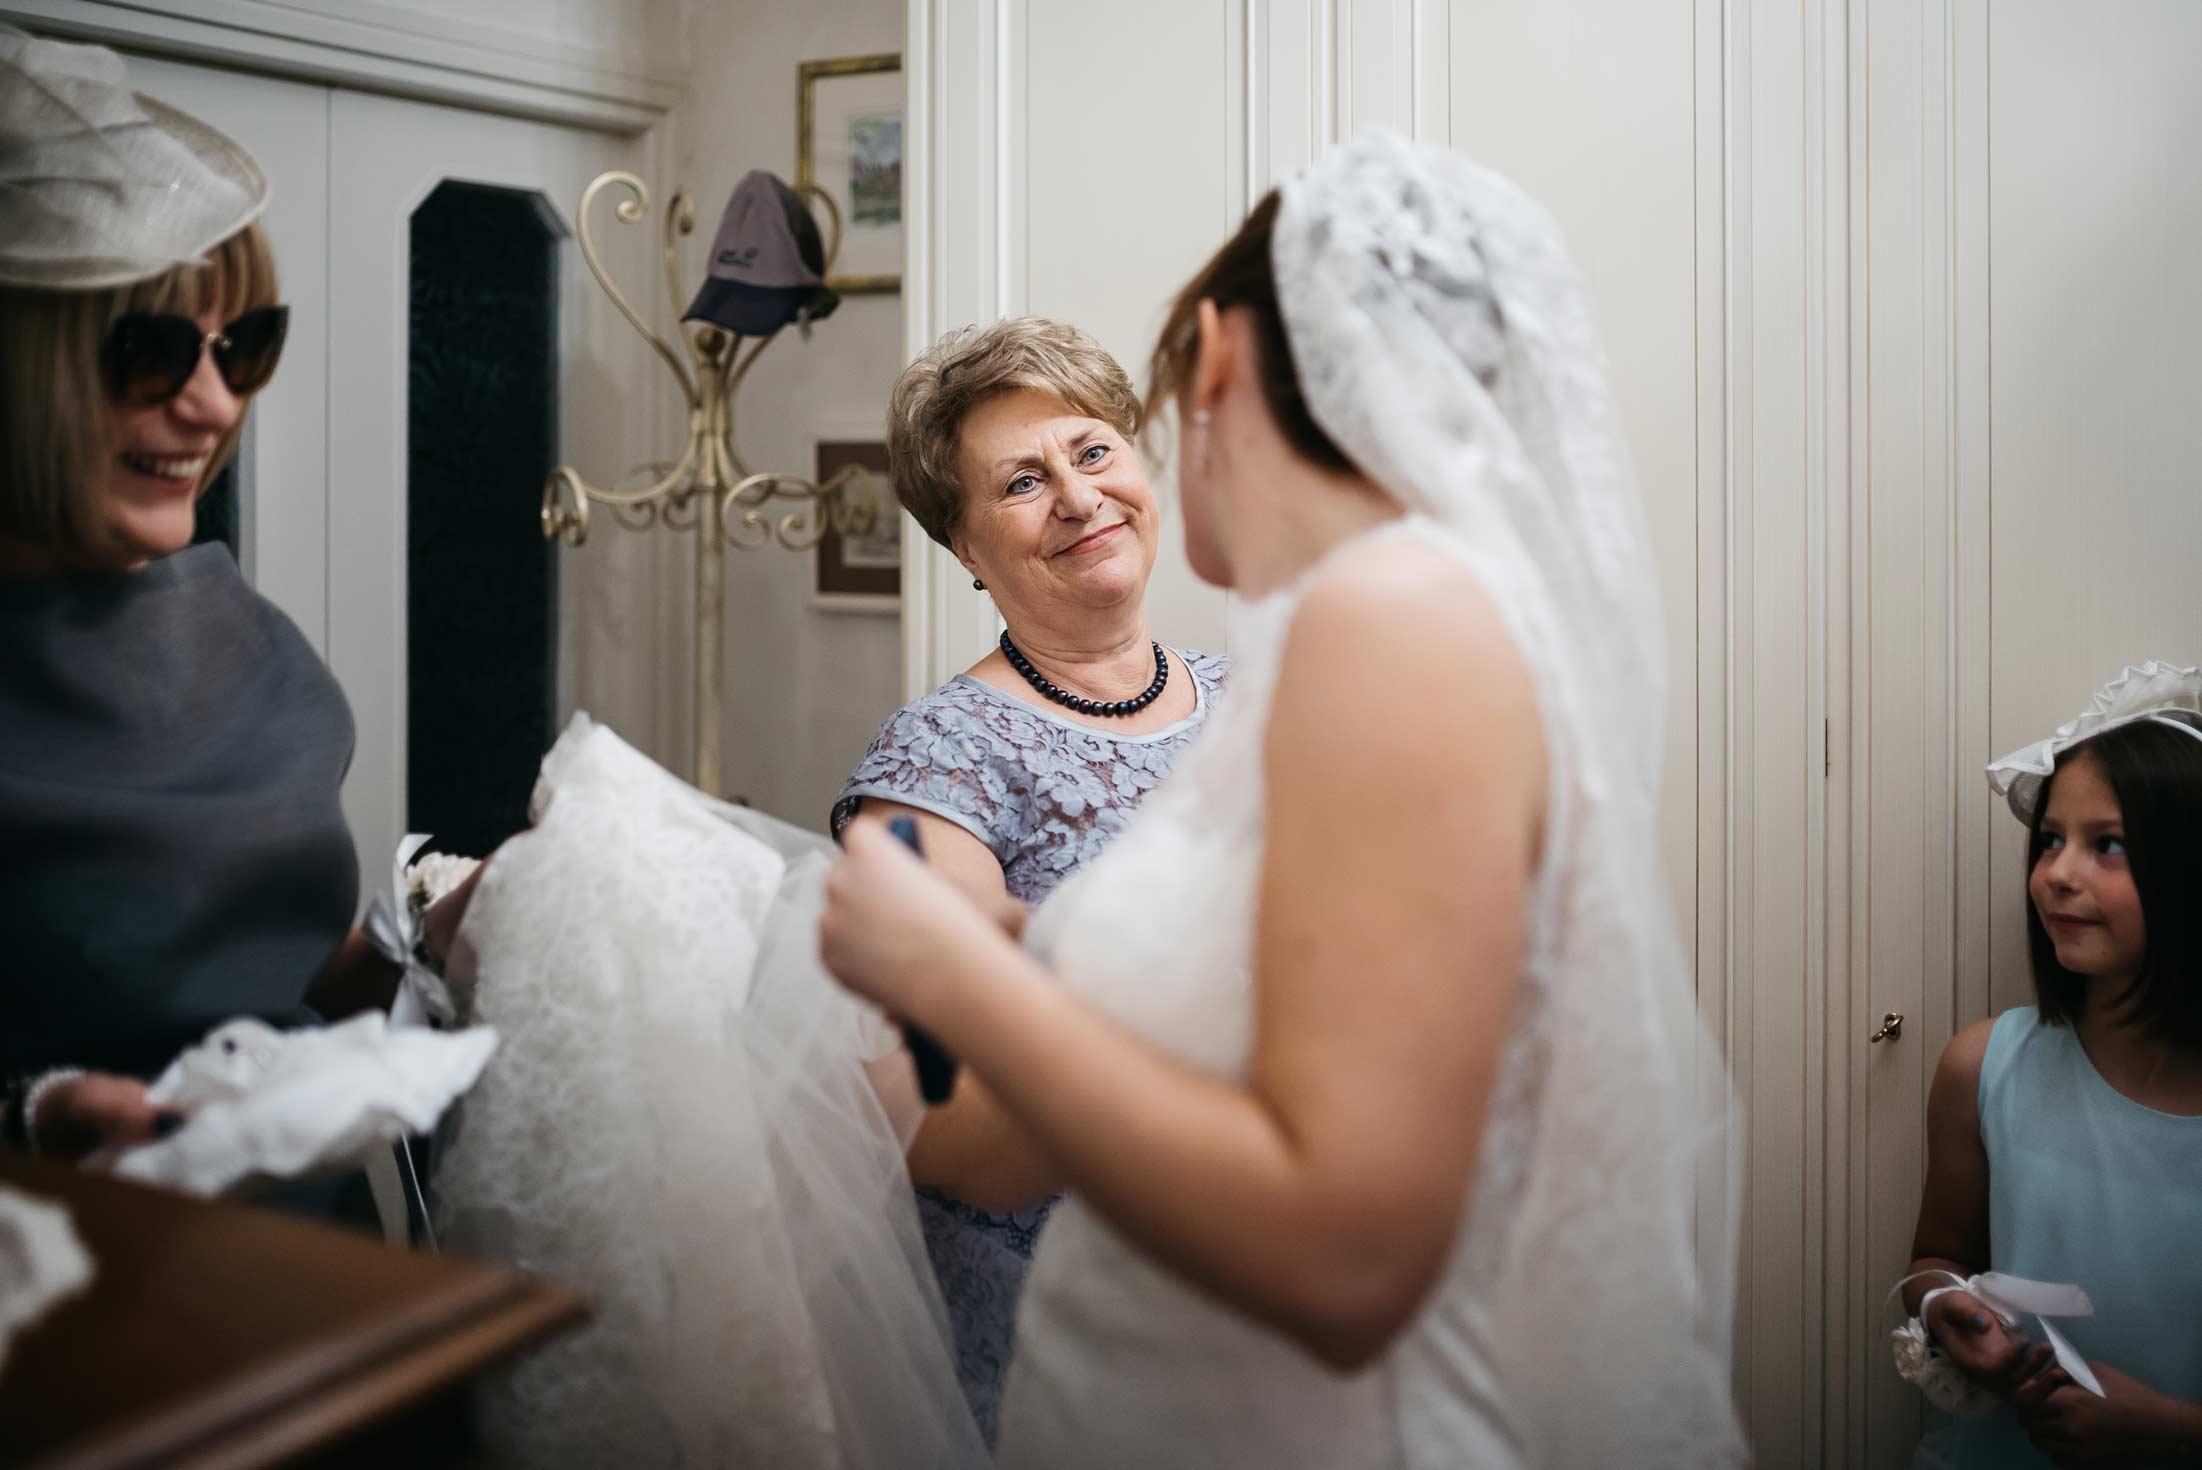 Fotografo-Matrimoni-Roma-Preparativi-Sposa